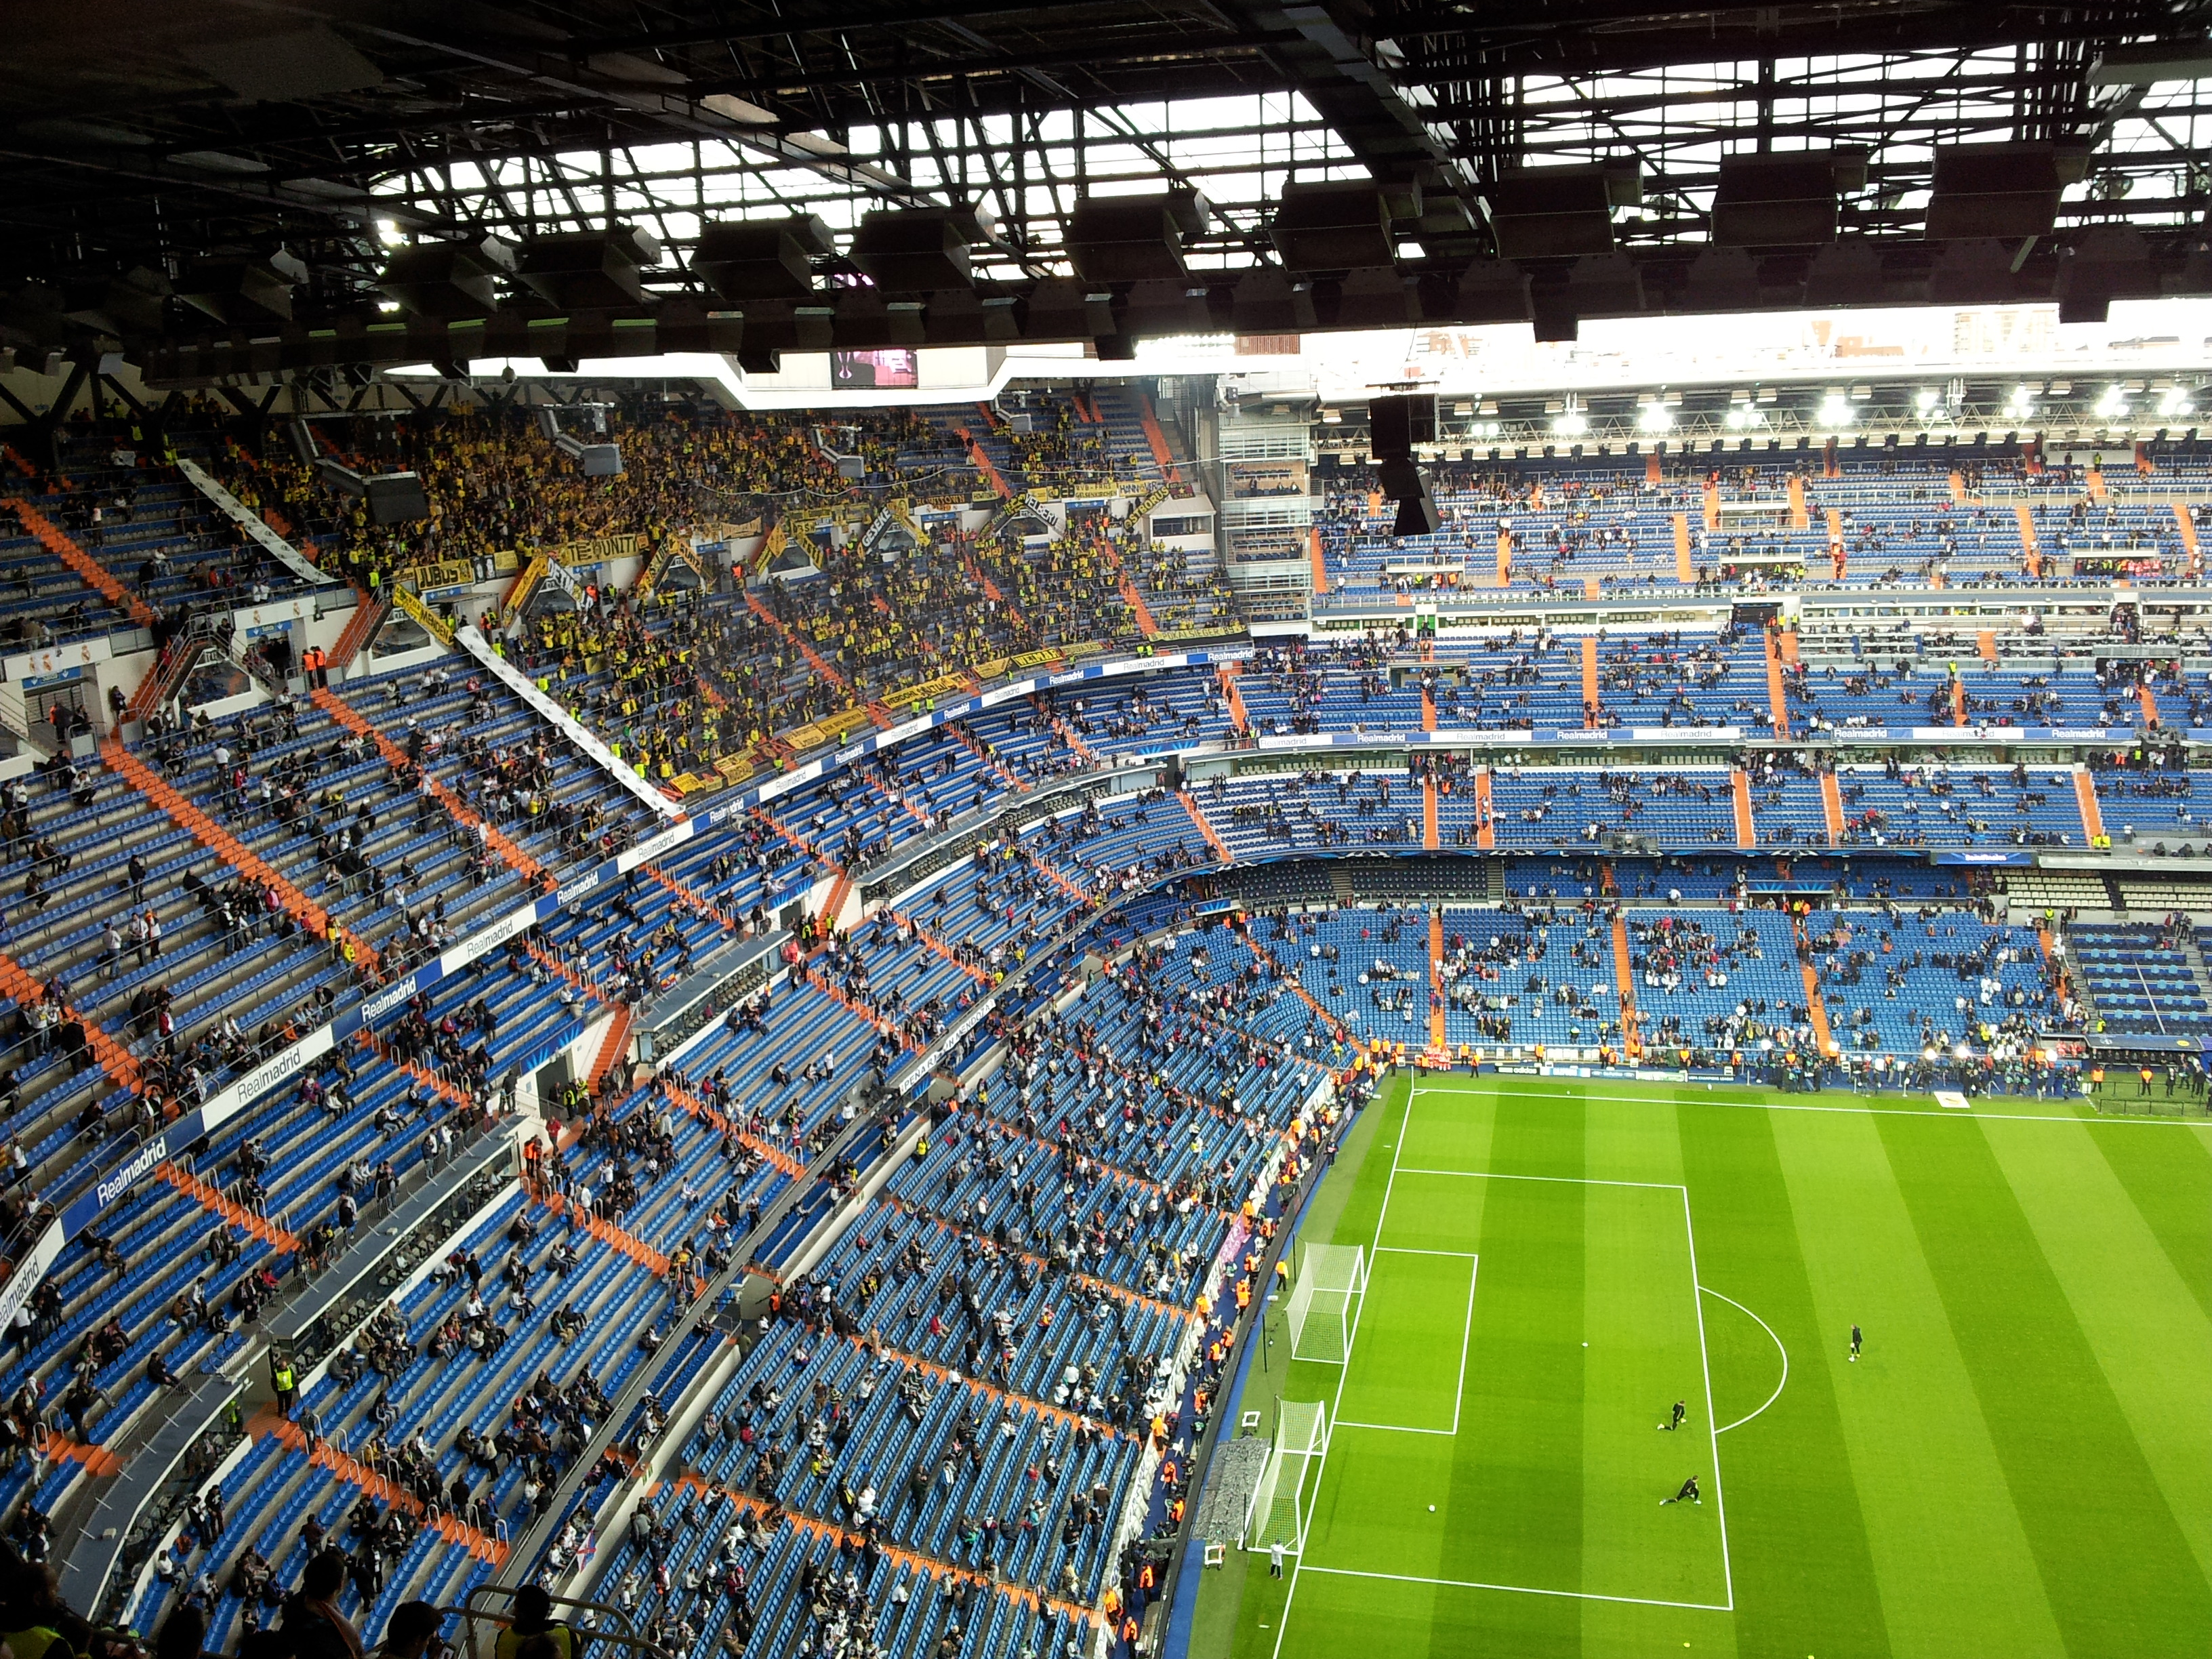 File:Santiago Bernabéu Stadium, Real Madrid - Borussia Dortm